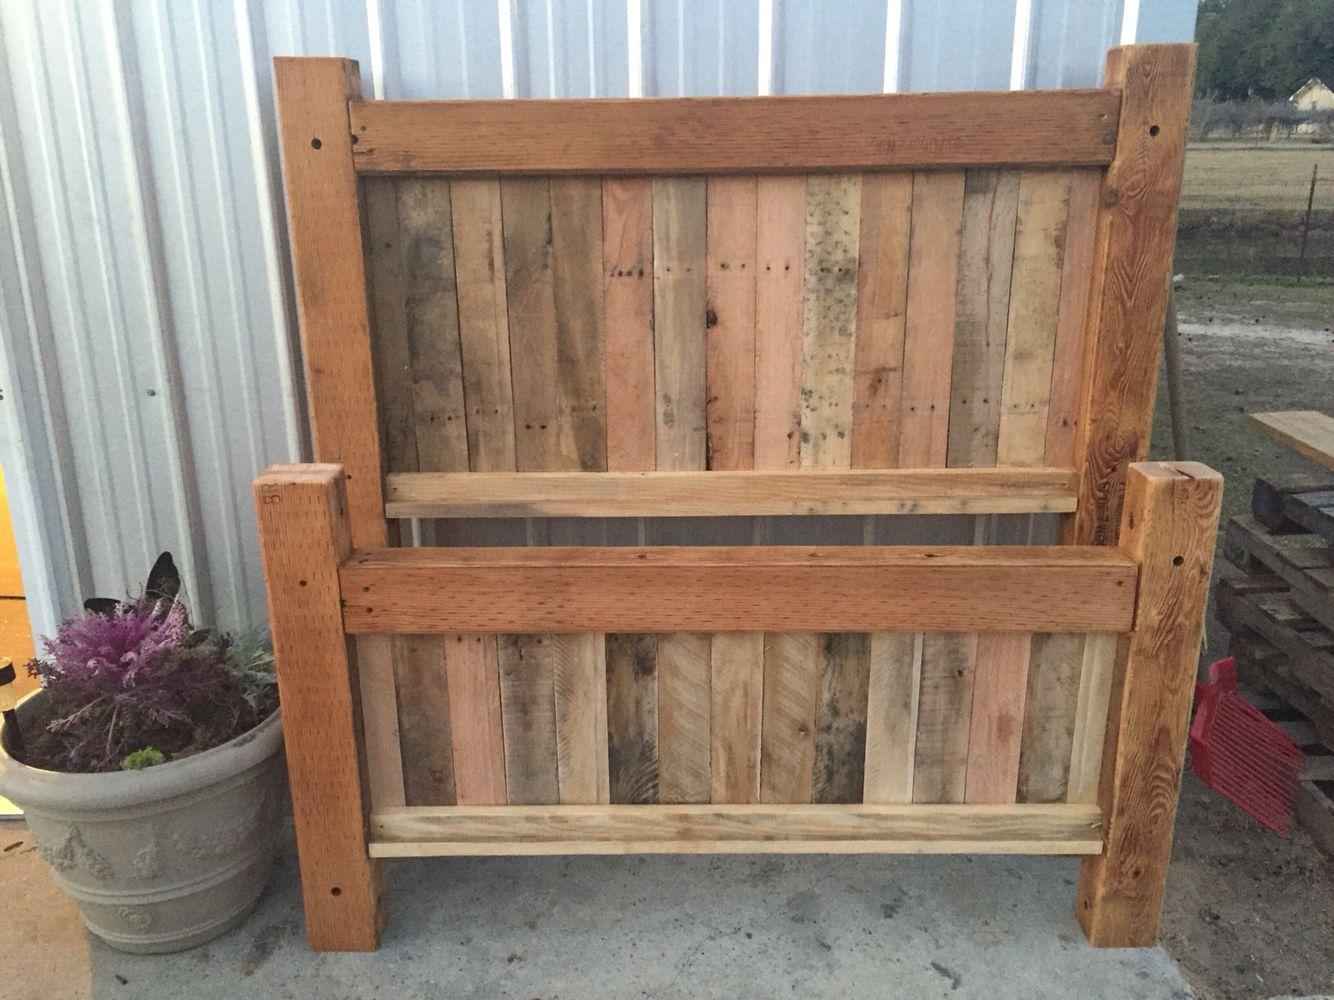 Rustic Handmade Pallet Full Size Headboard And Footboard Diy